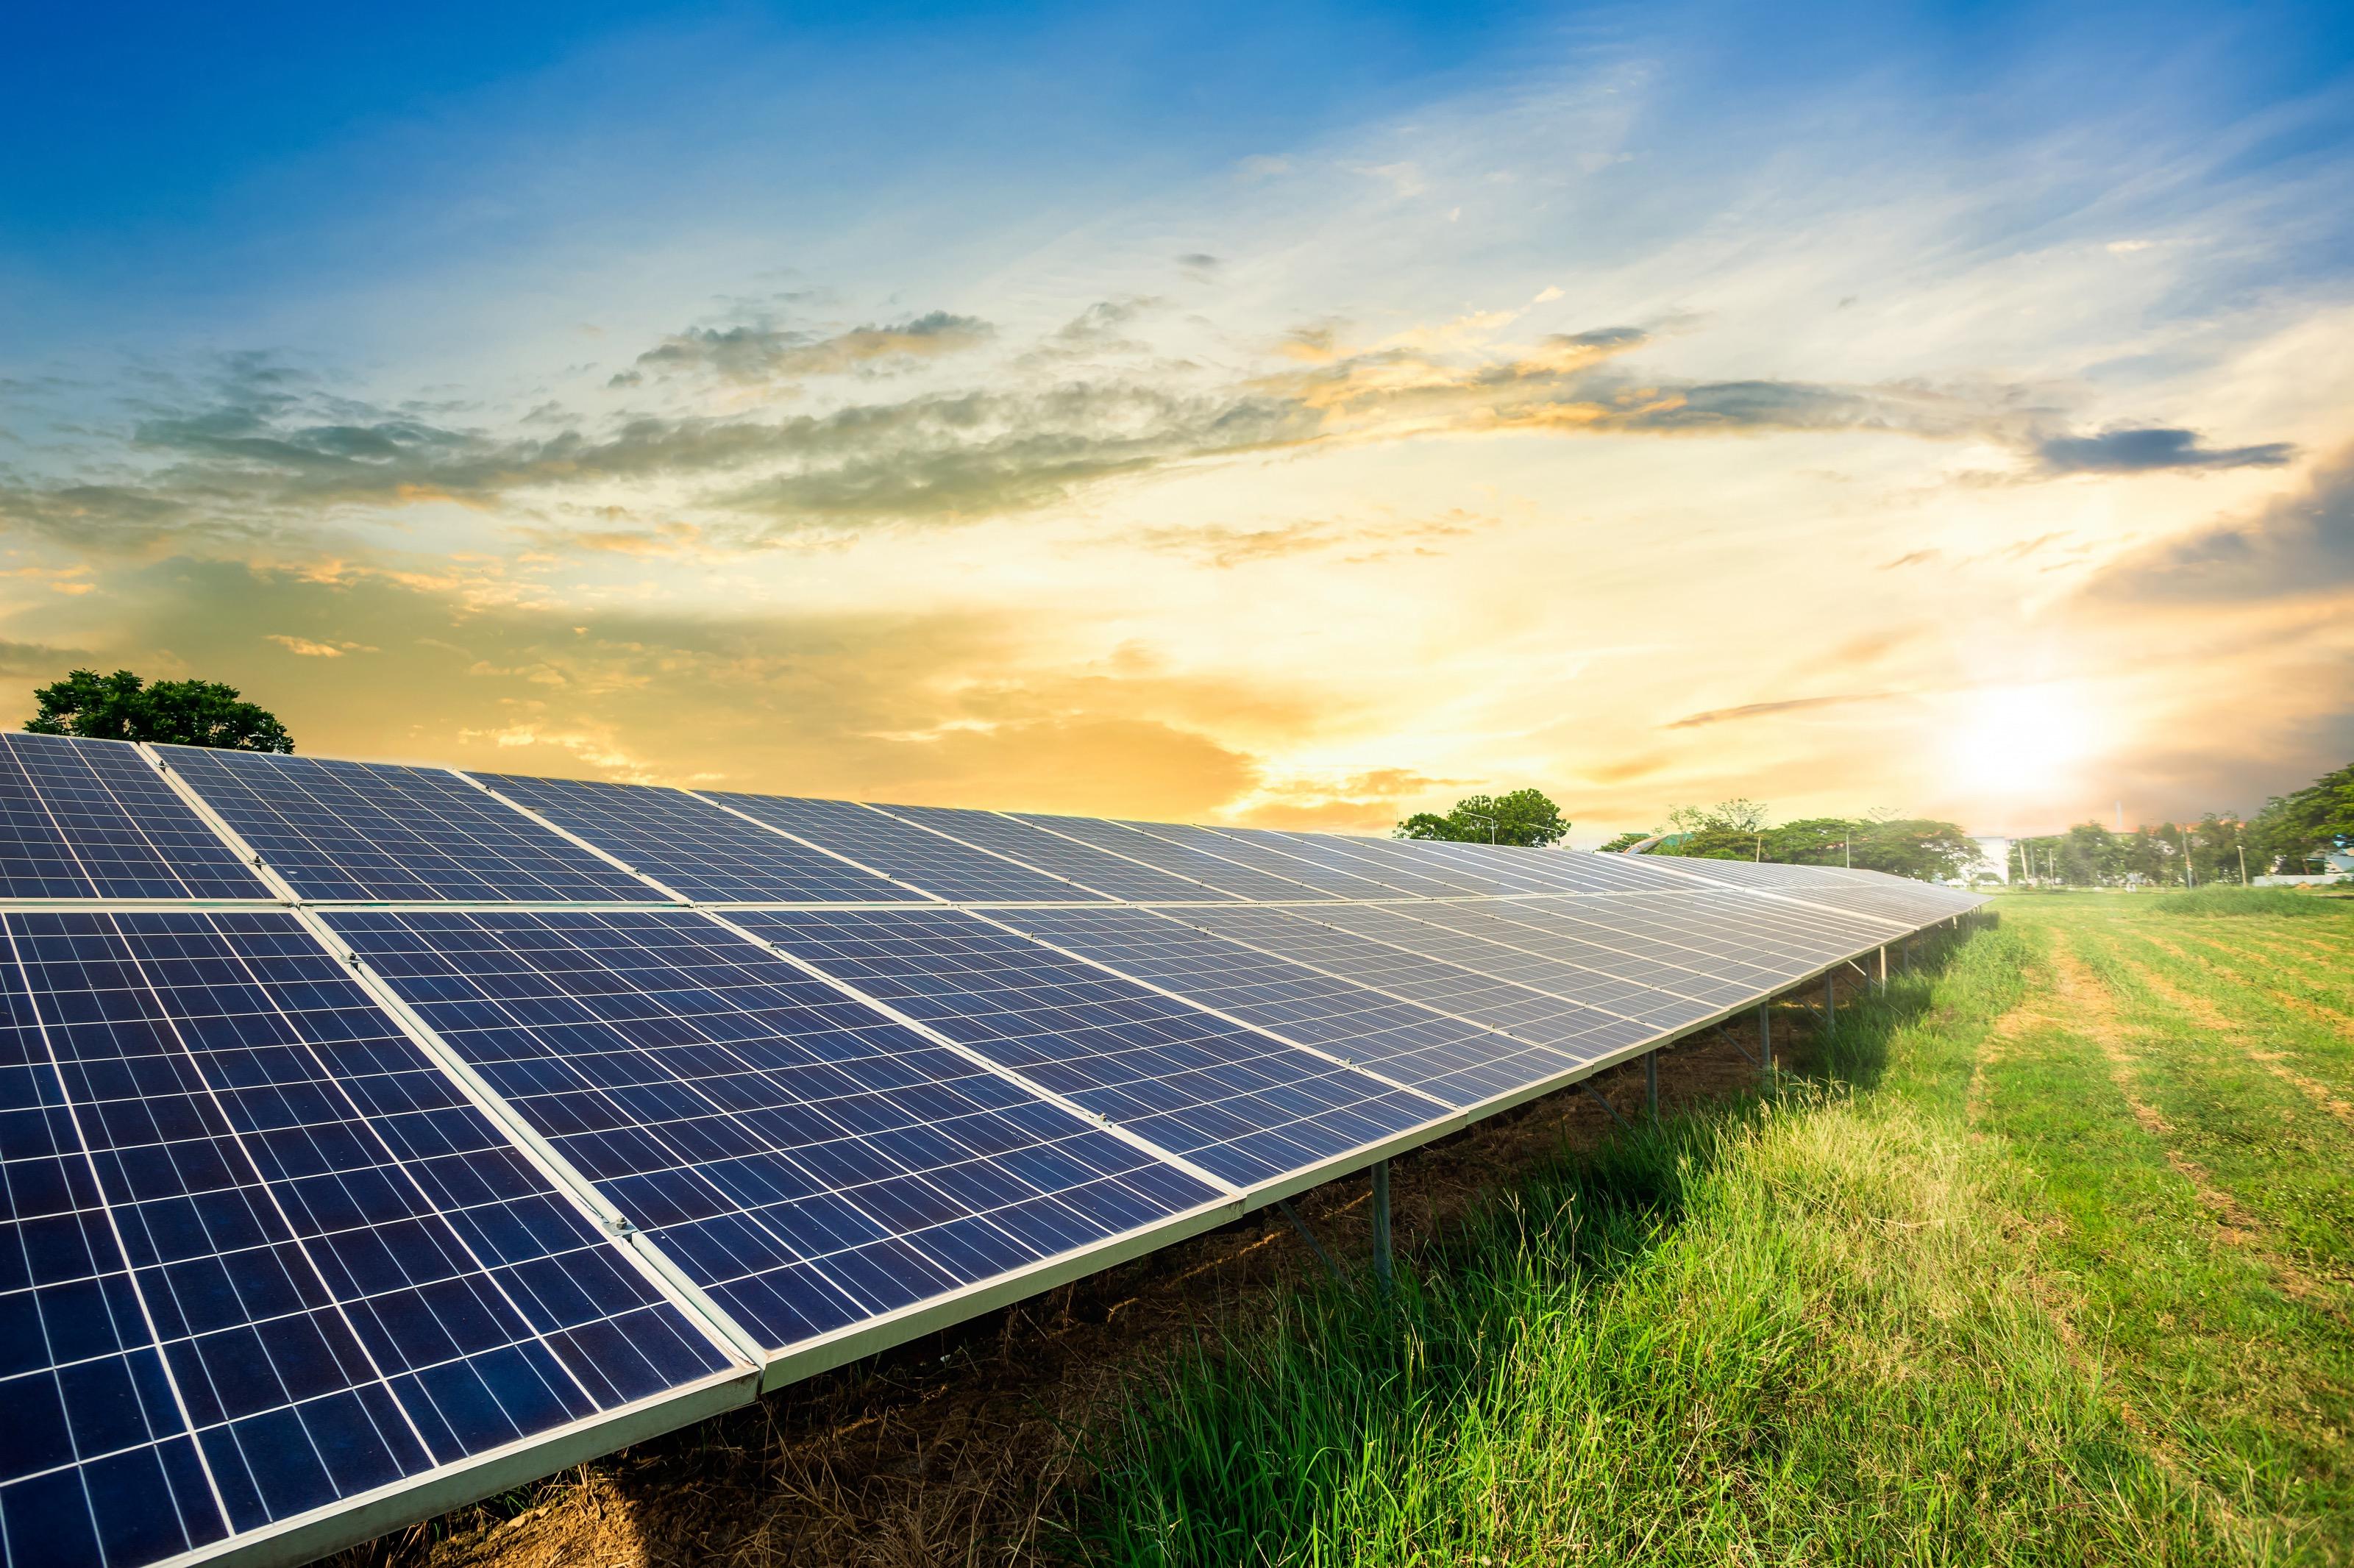 vecteezy_solar-panel-cell-on-sunset-sky-background-clean-alternative-power-energy-concept_1235998